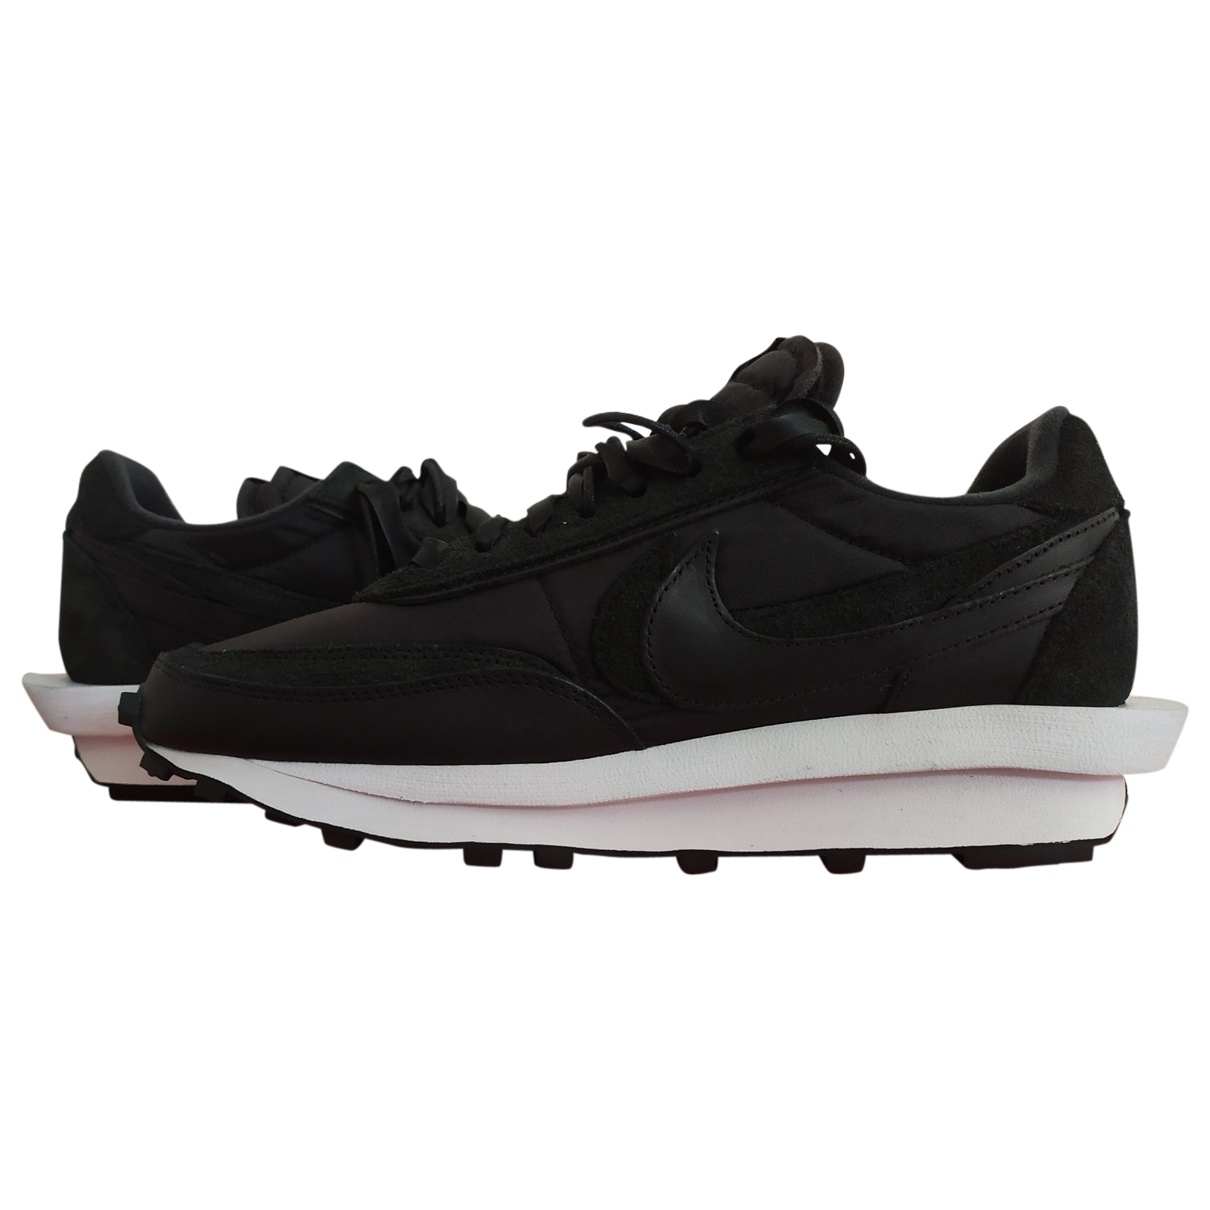 Nike X Sacaï LDV Waffle Black Cloth Trainers for Men 44 EU